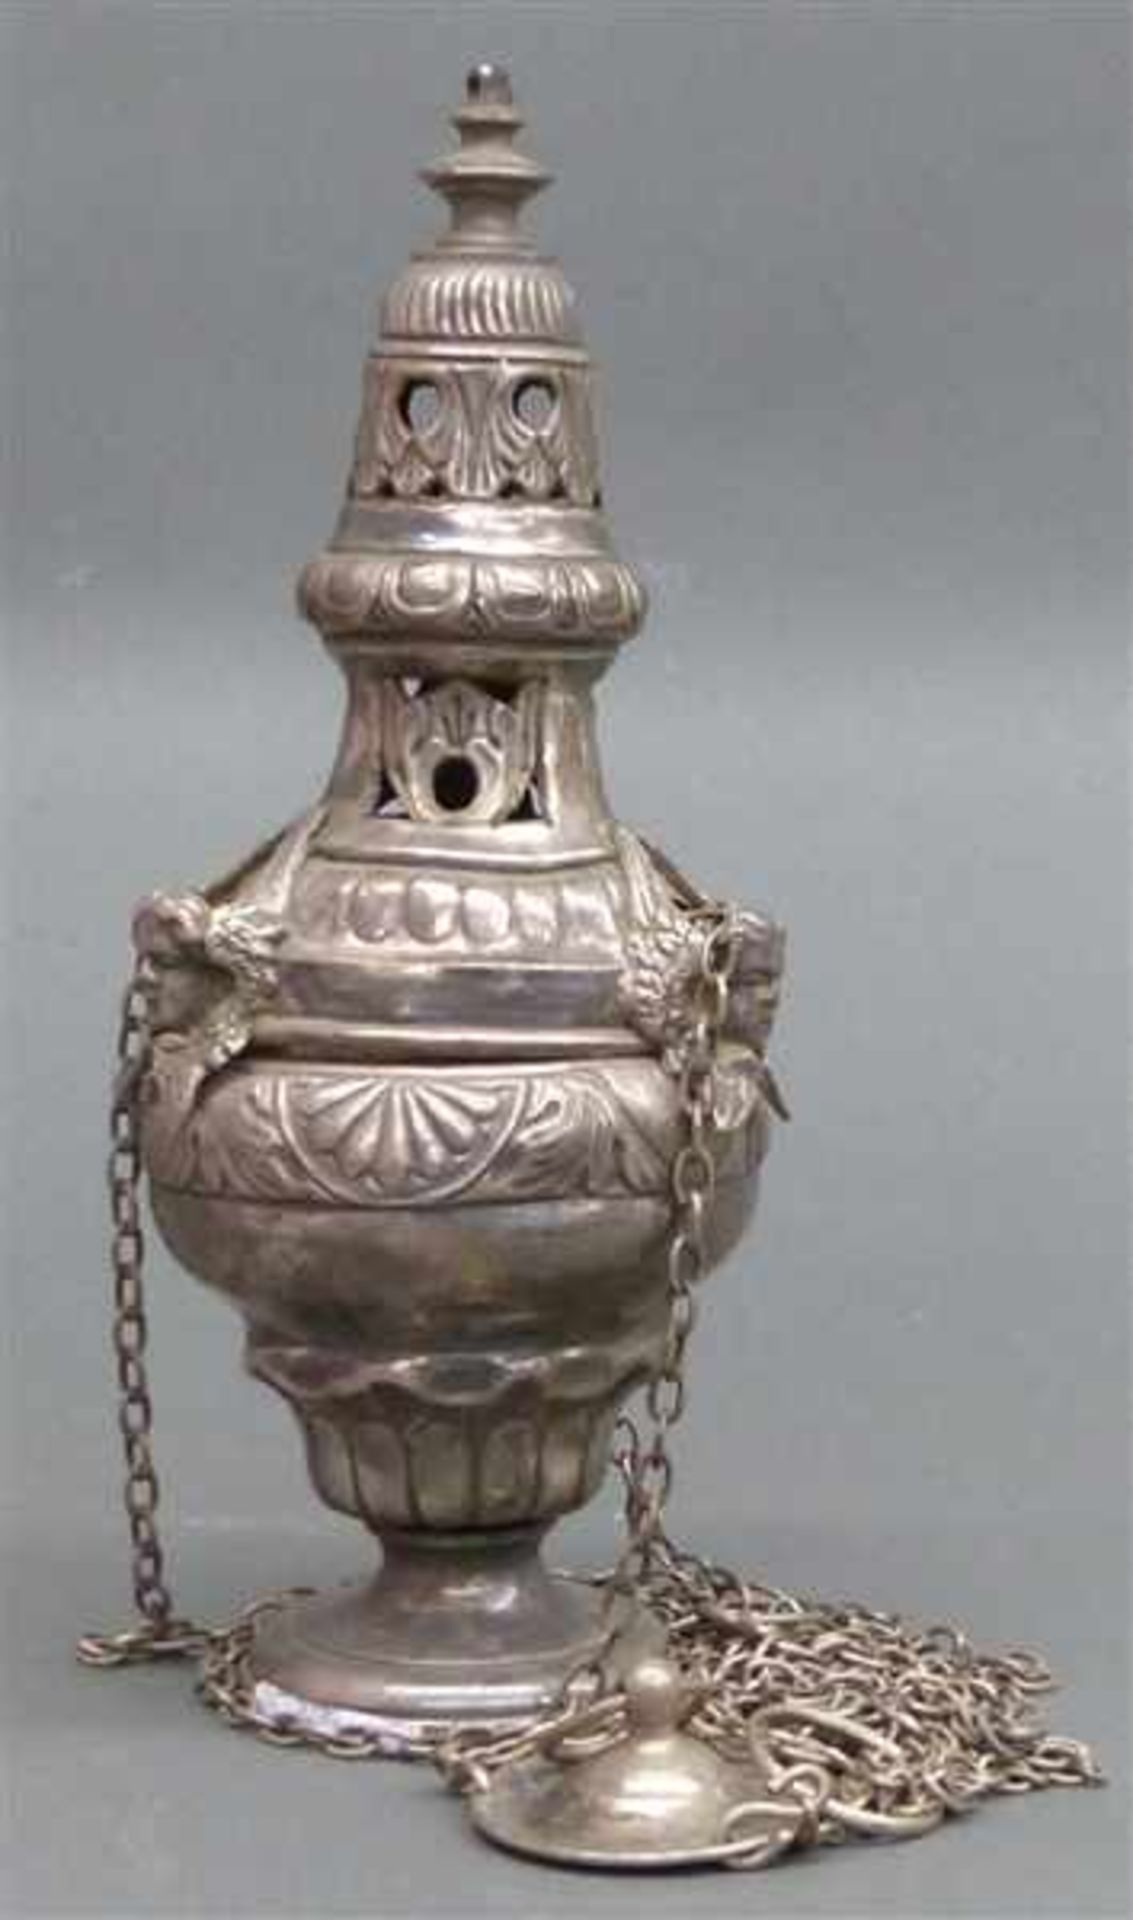 Weihrauchgefäß Silber, 19. Jh., reliefierter Puttidekor, h 29 cm,